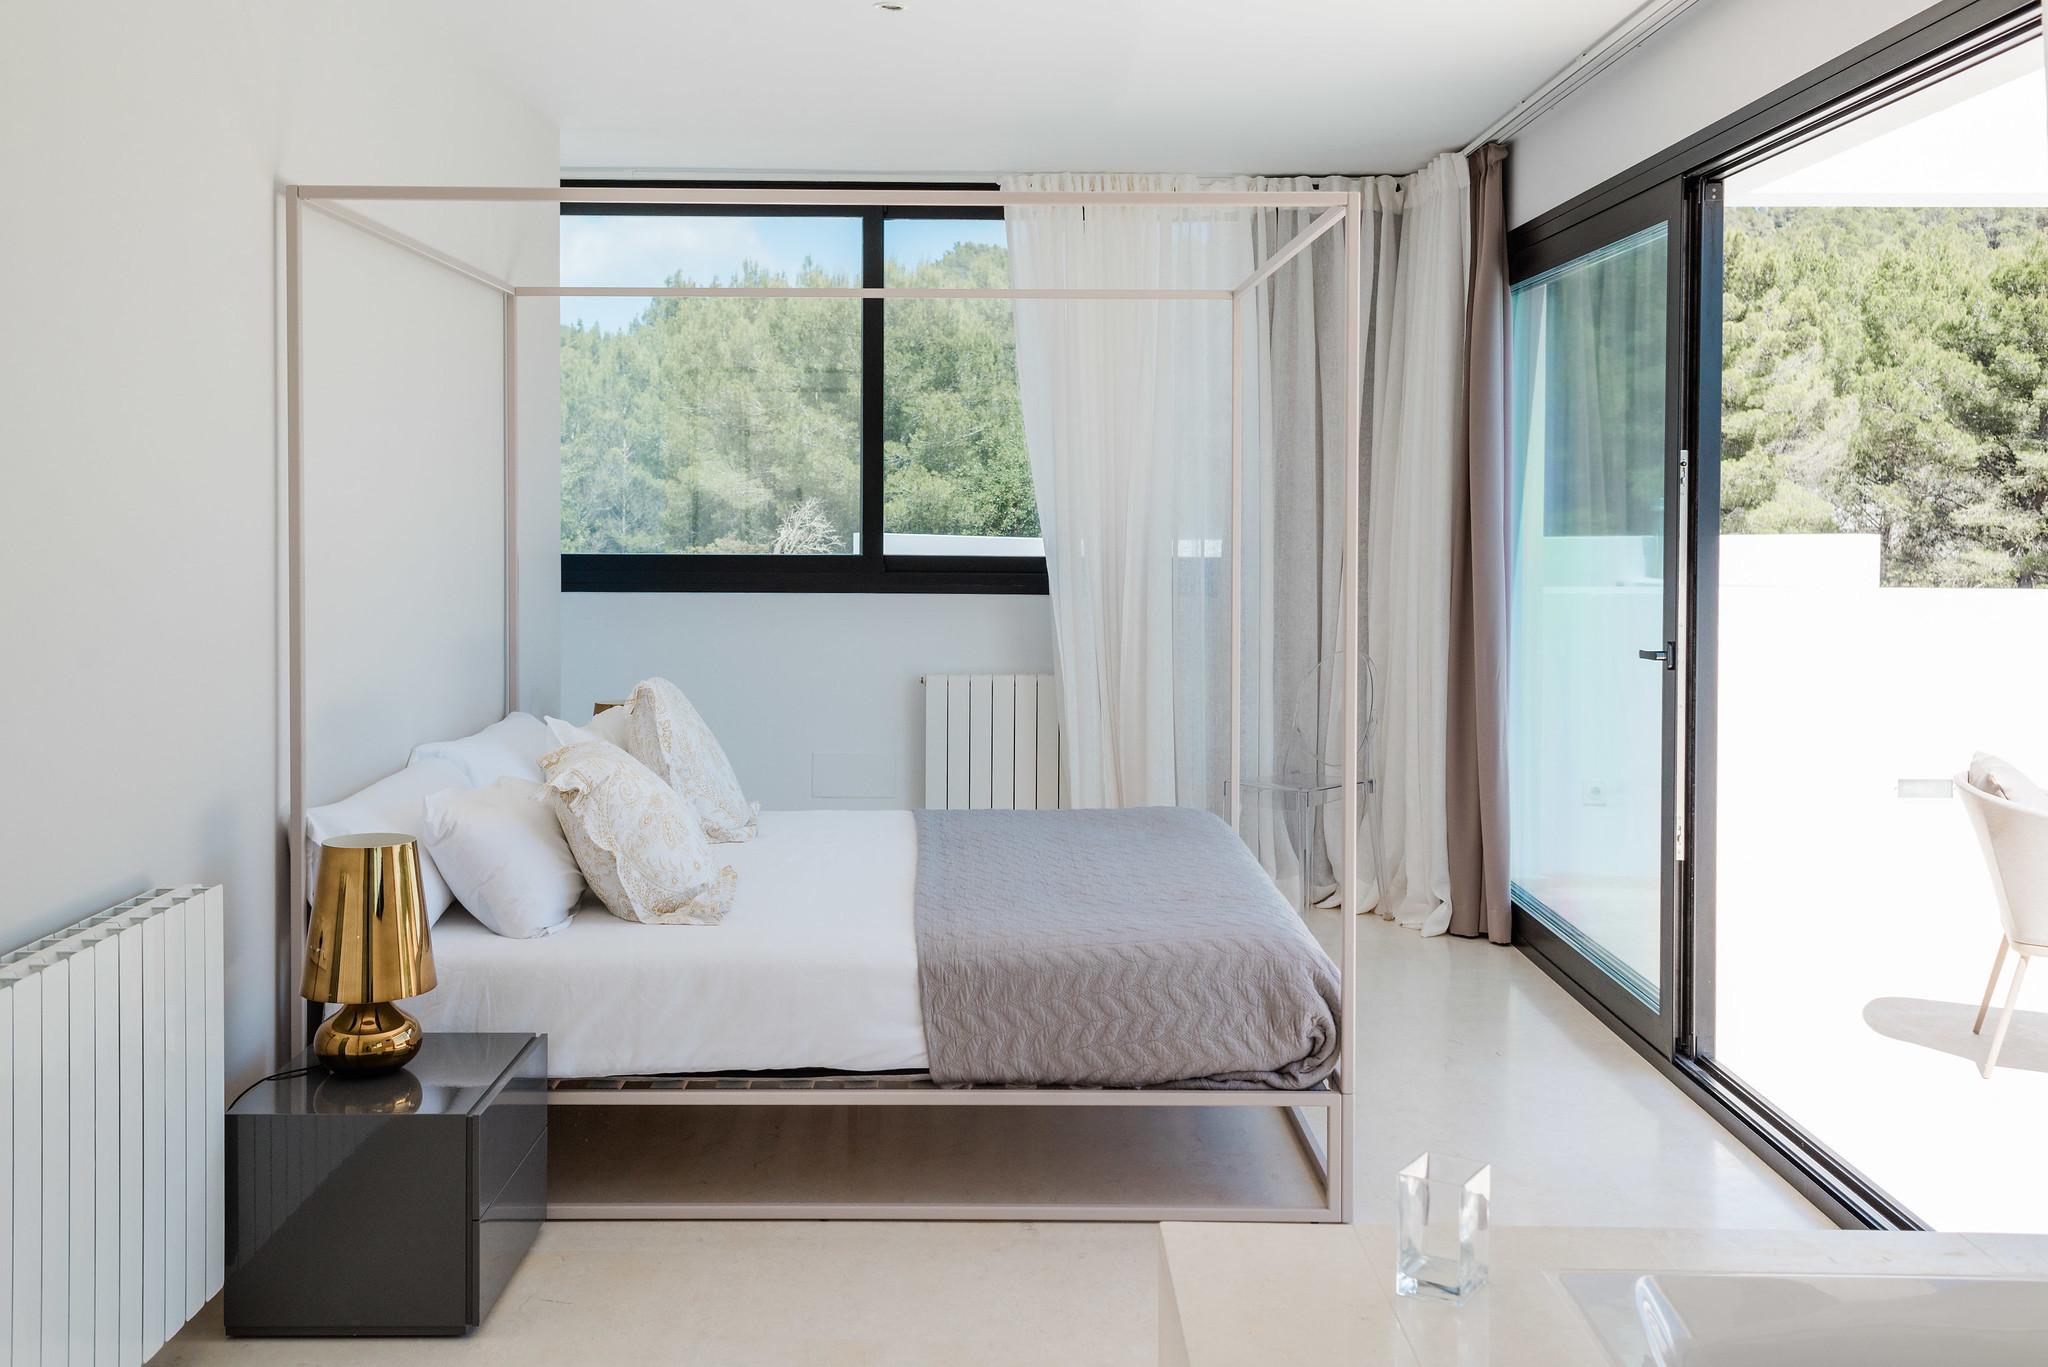 https://www.white-ibiza.com/wp-content/uploads/2020/06/white-ibiza-villas-can-carmen-interior2.jpg